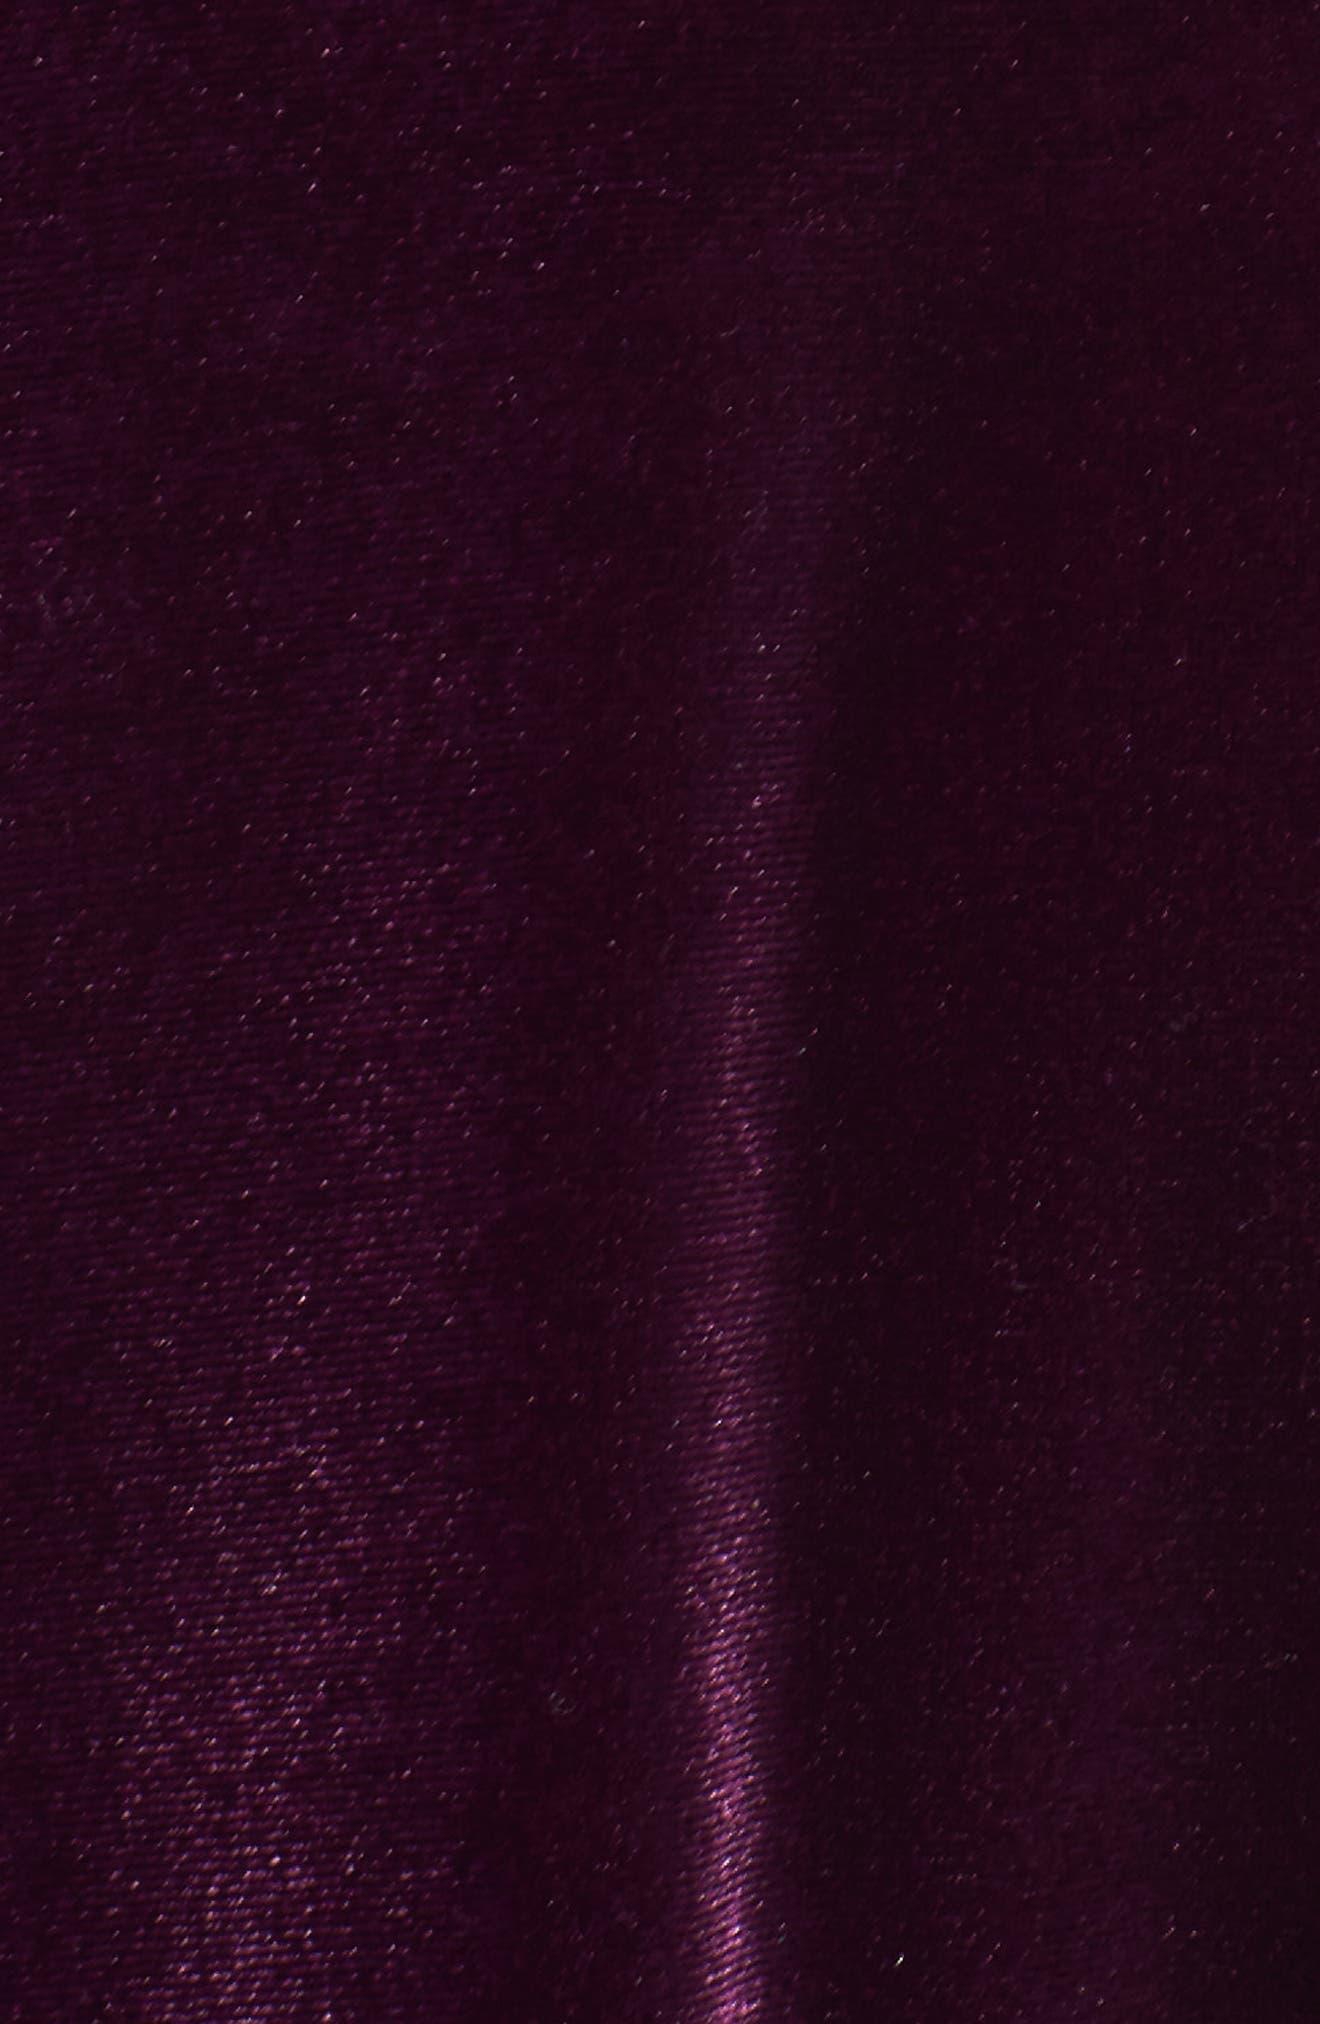 High Neck Lace & Velvet Cocktail Dress,                             Alternate thumbnail 5, color,                             572